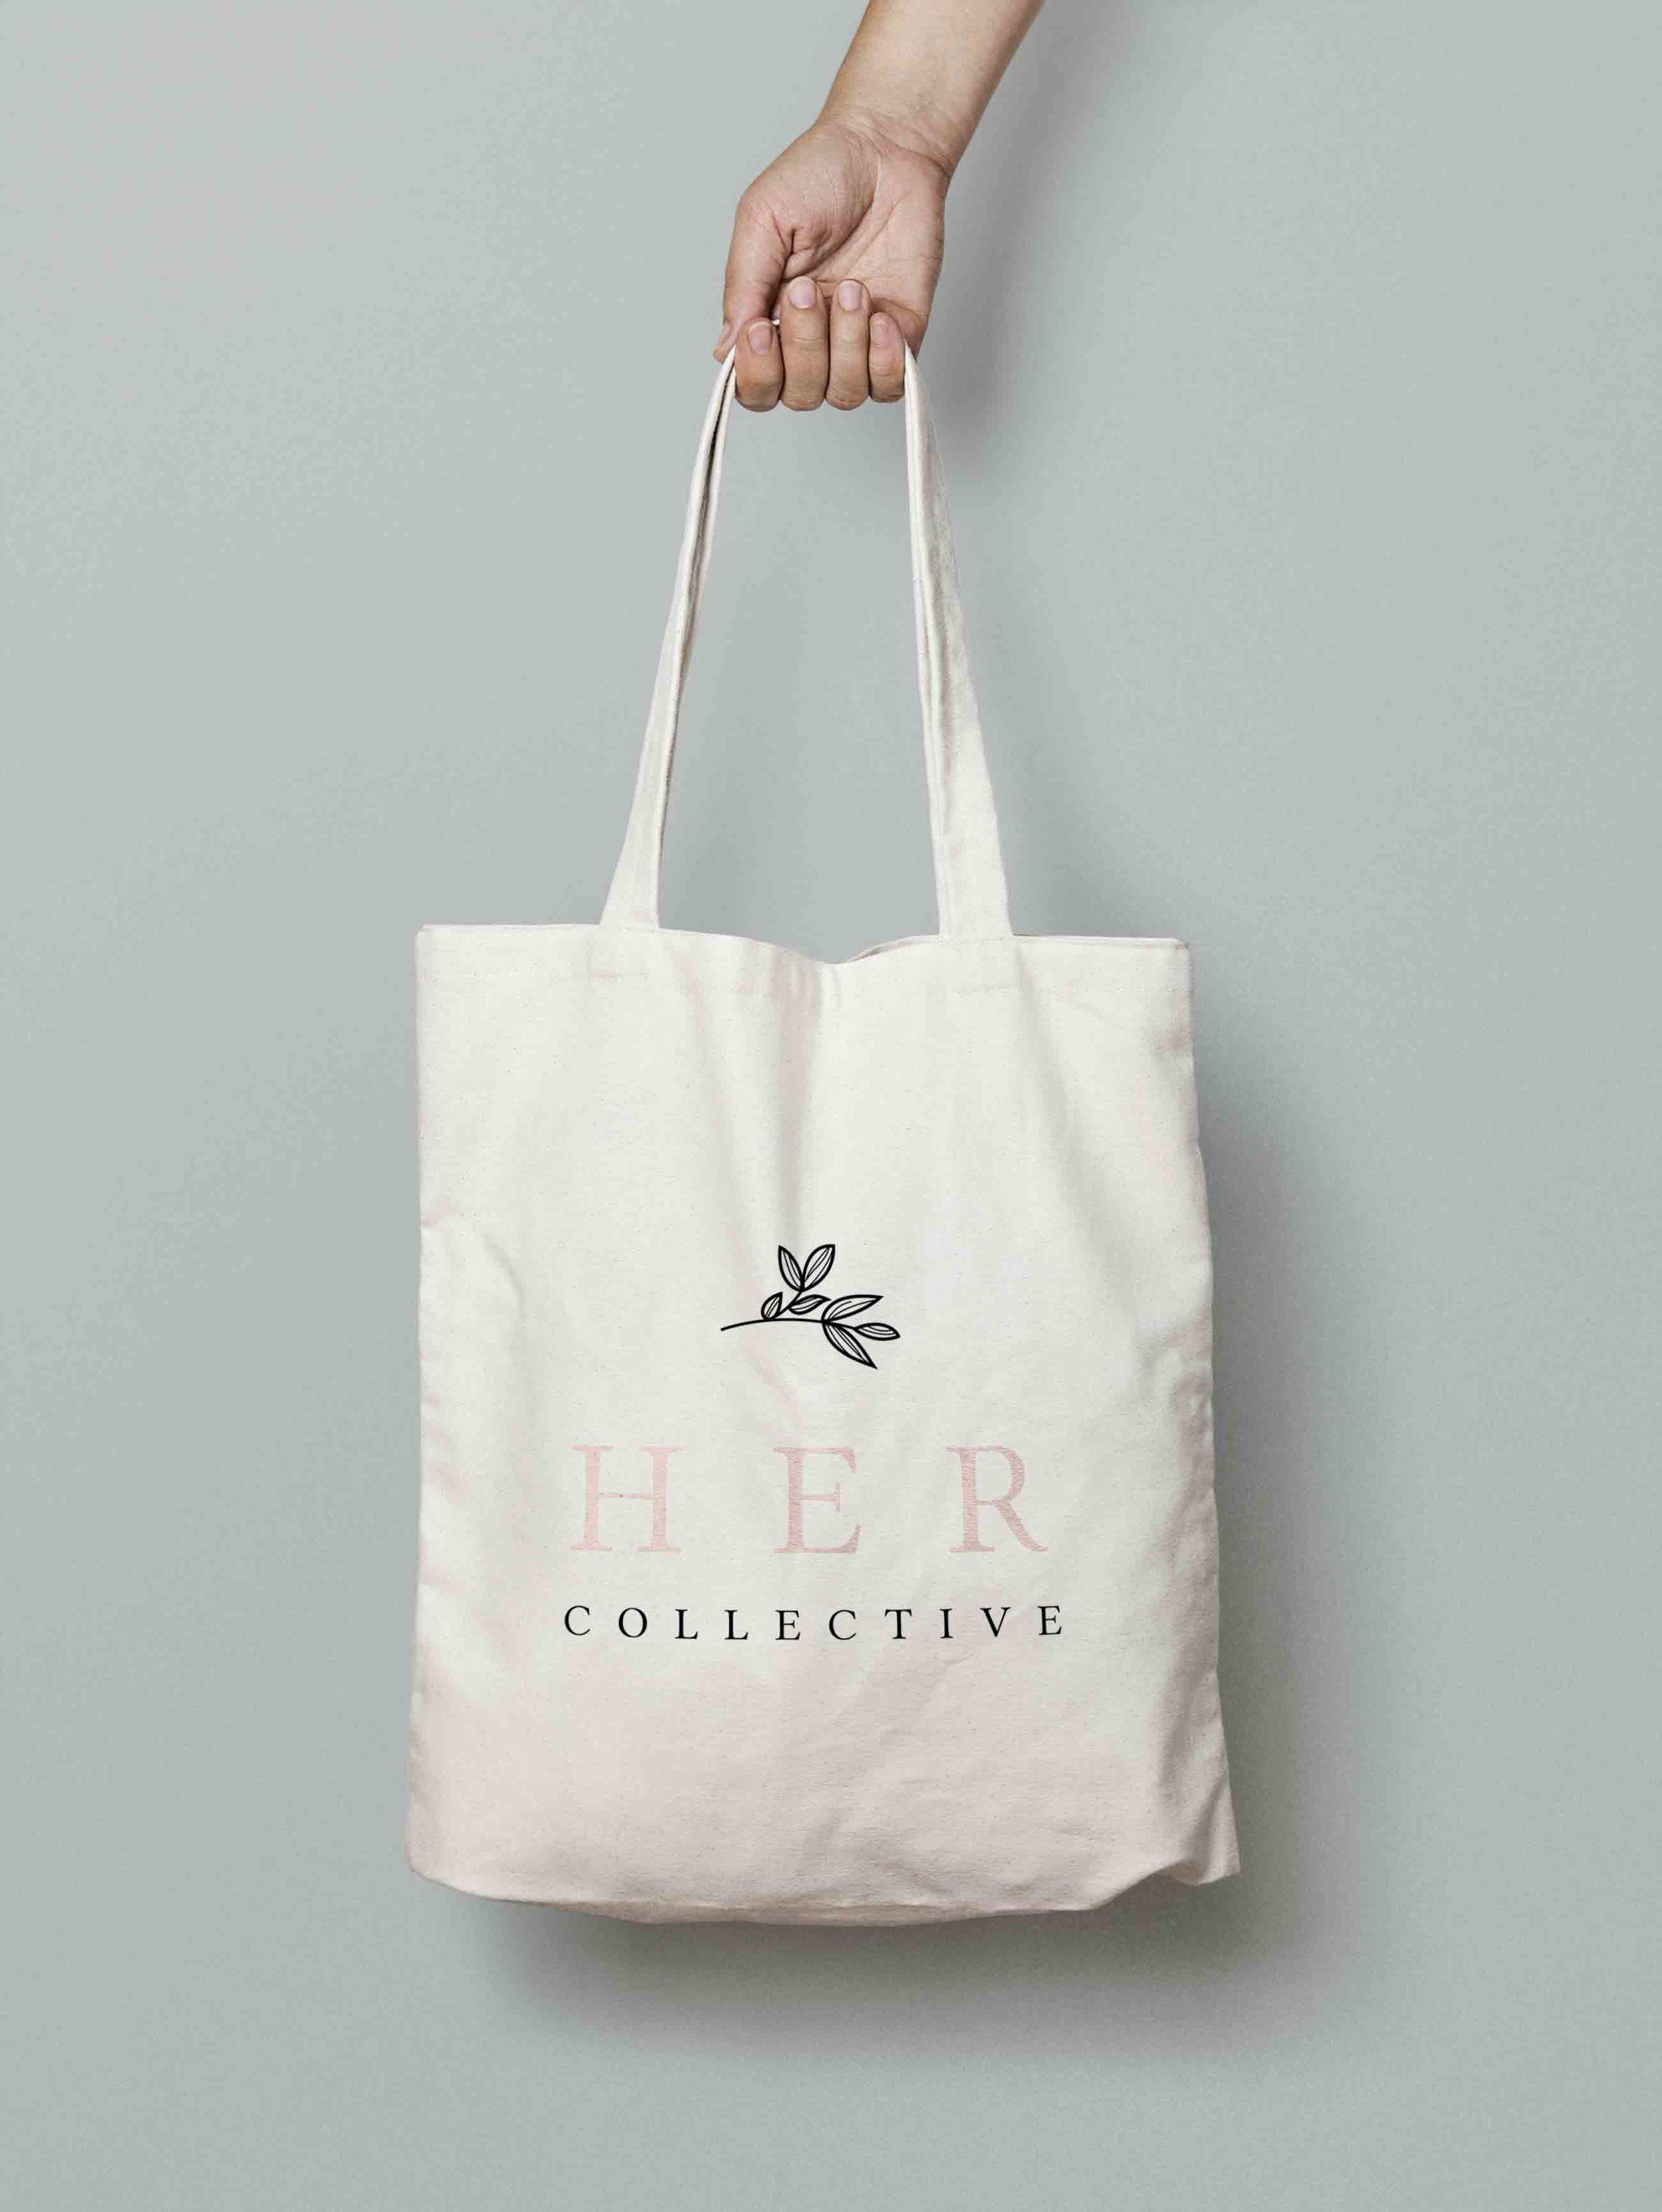 gatherc bag.jpg